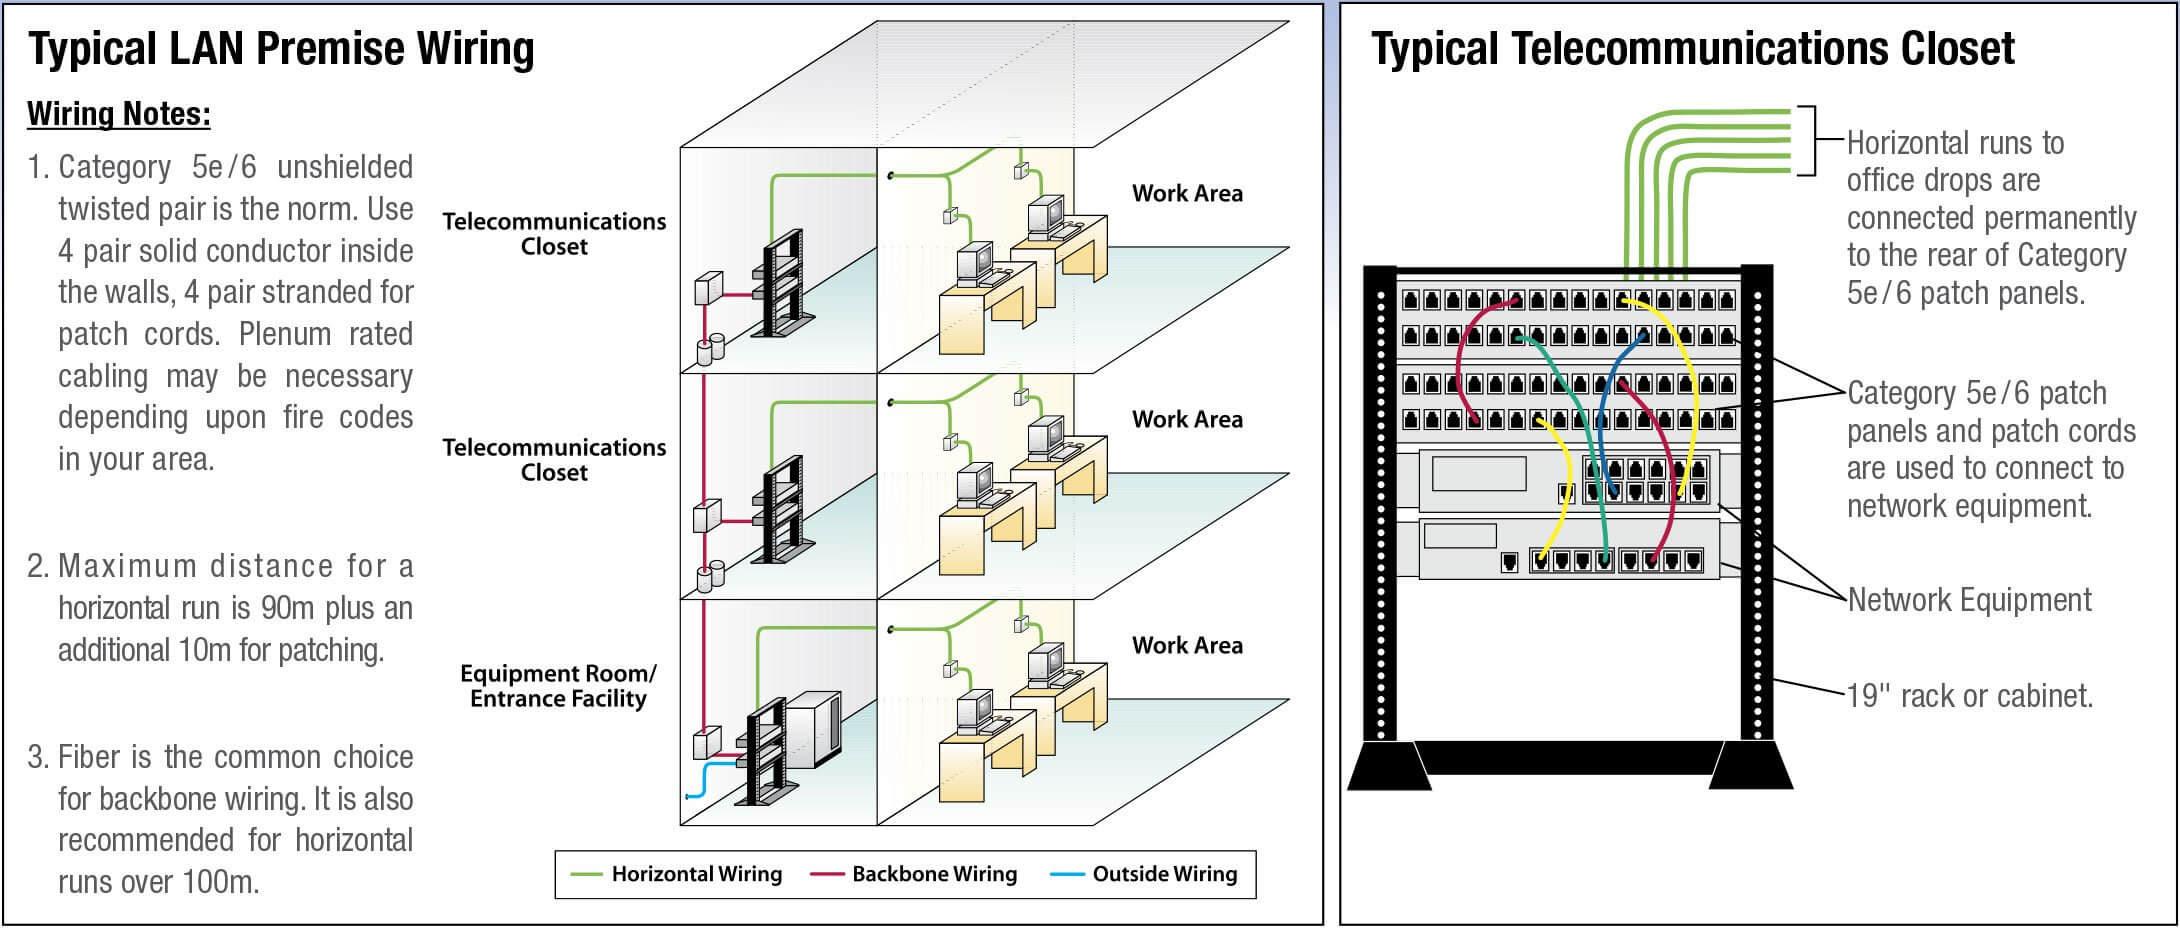 Legrand Rj45 Socket Wiring Diagram from lh6.googleusercontent.com